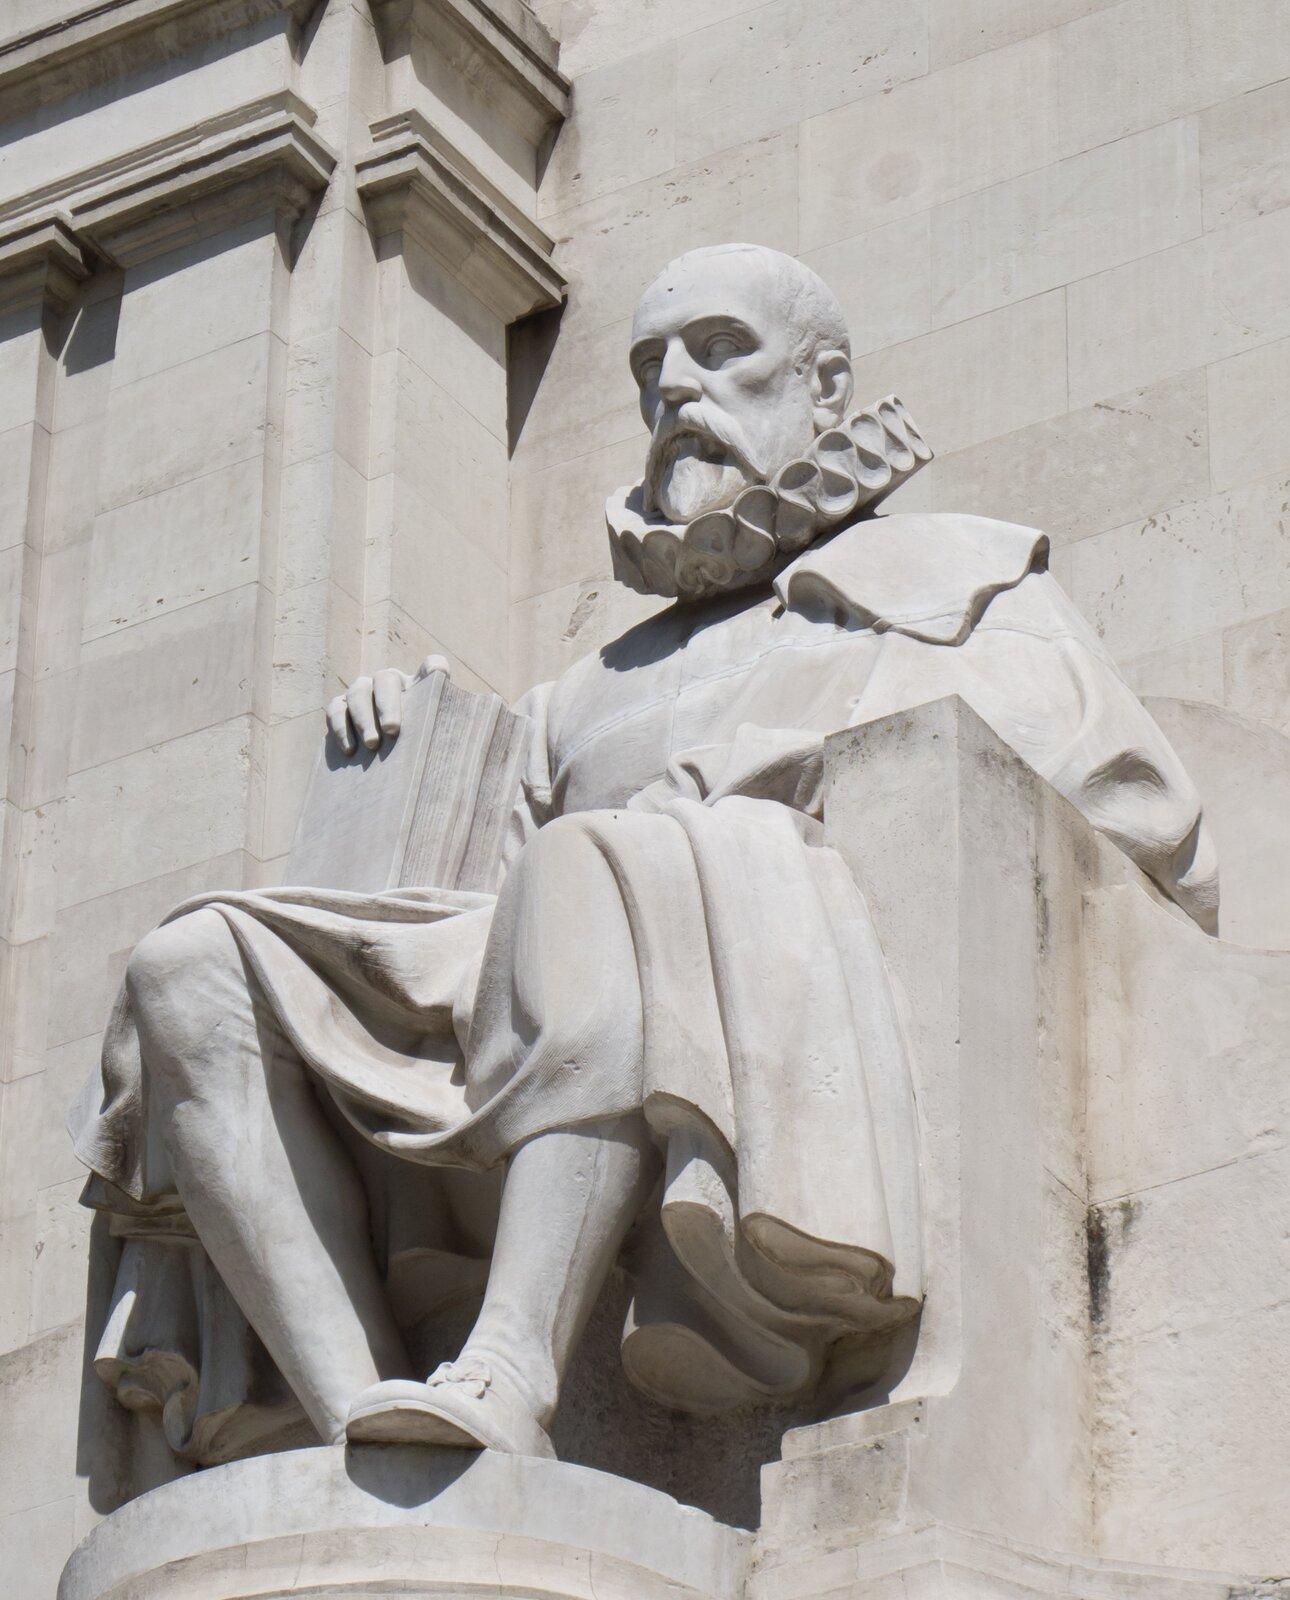 Cervantes – pomnik wMadrycie – fragment Cervantes – pomnik wMadrycie – fragment Źródło: Carlos Delgado, Wikimedia Commons, licencja: CC BY-SA 3.0.